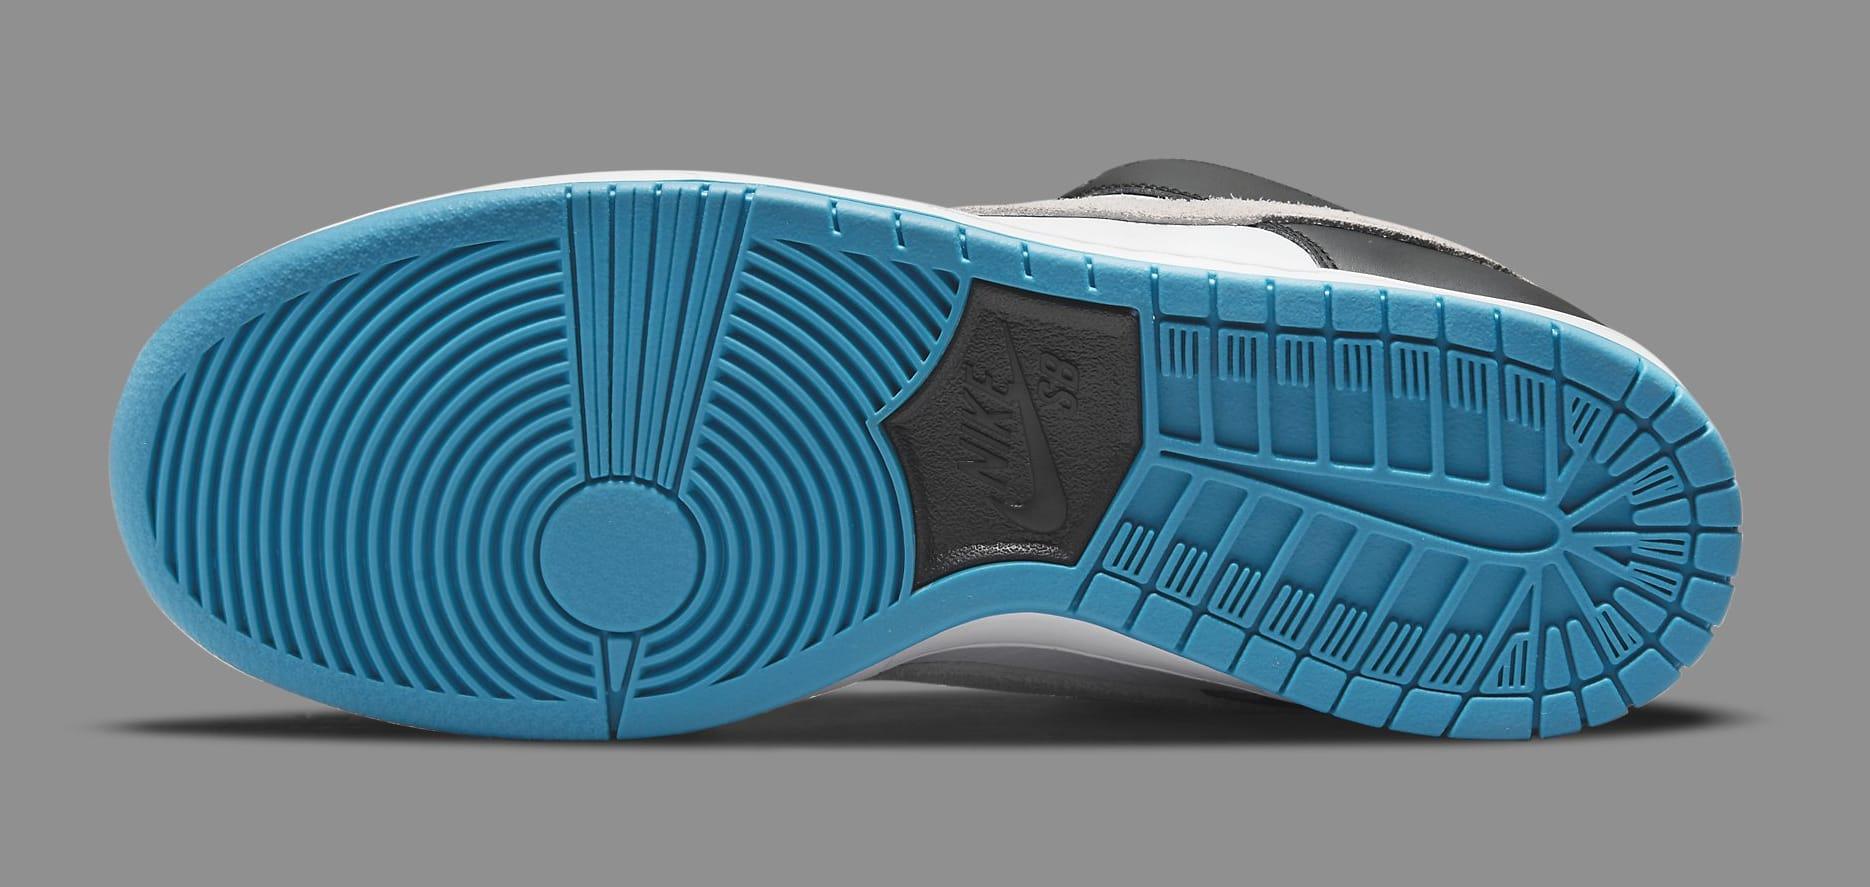 Nike SB Dunk Low 'Laser Blue' BQ6817-101 Outsole